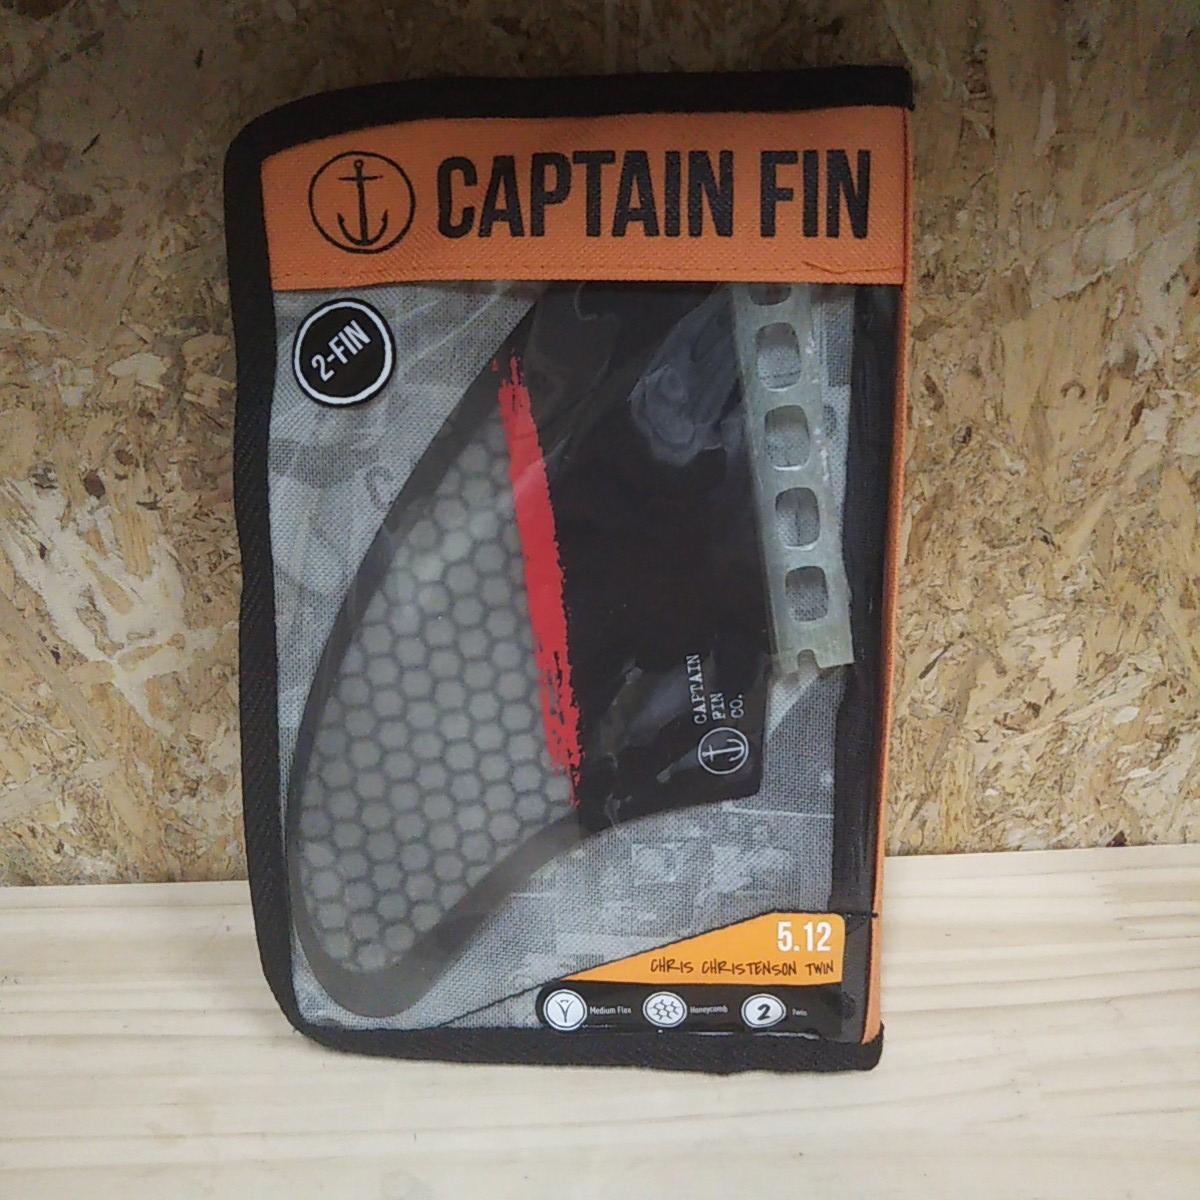 CAPTAIN FIN CHRIS CHRISTENSON TWIN クリステンソン ツインフィン_画像4